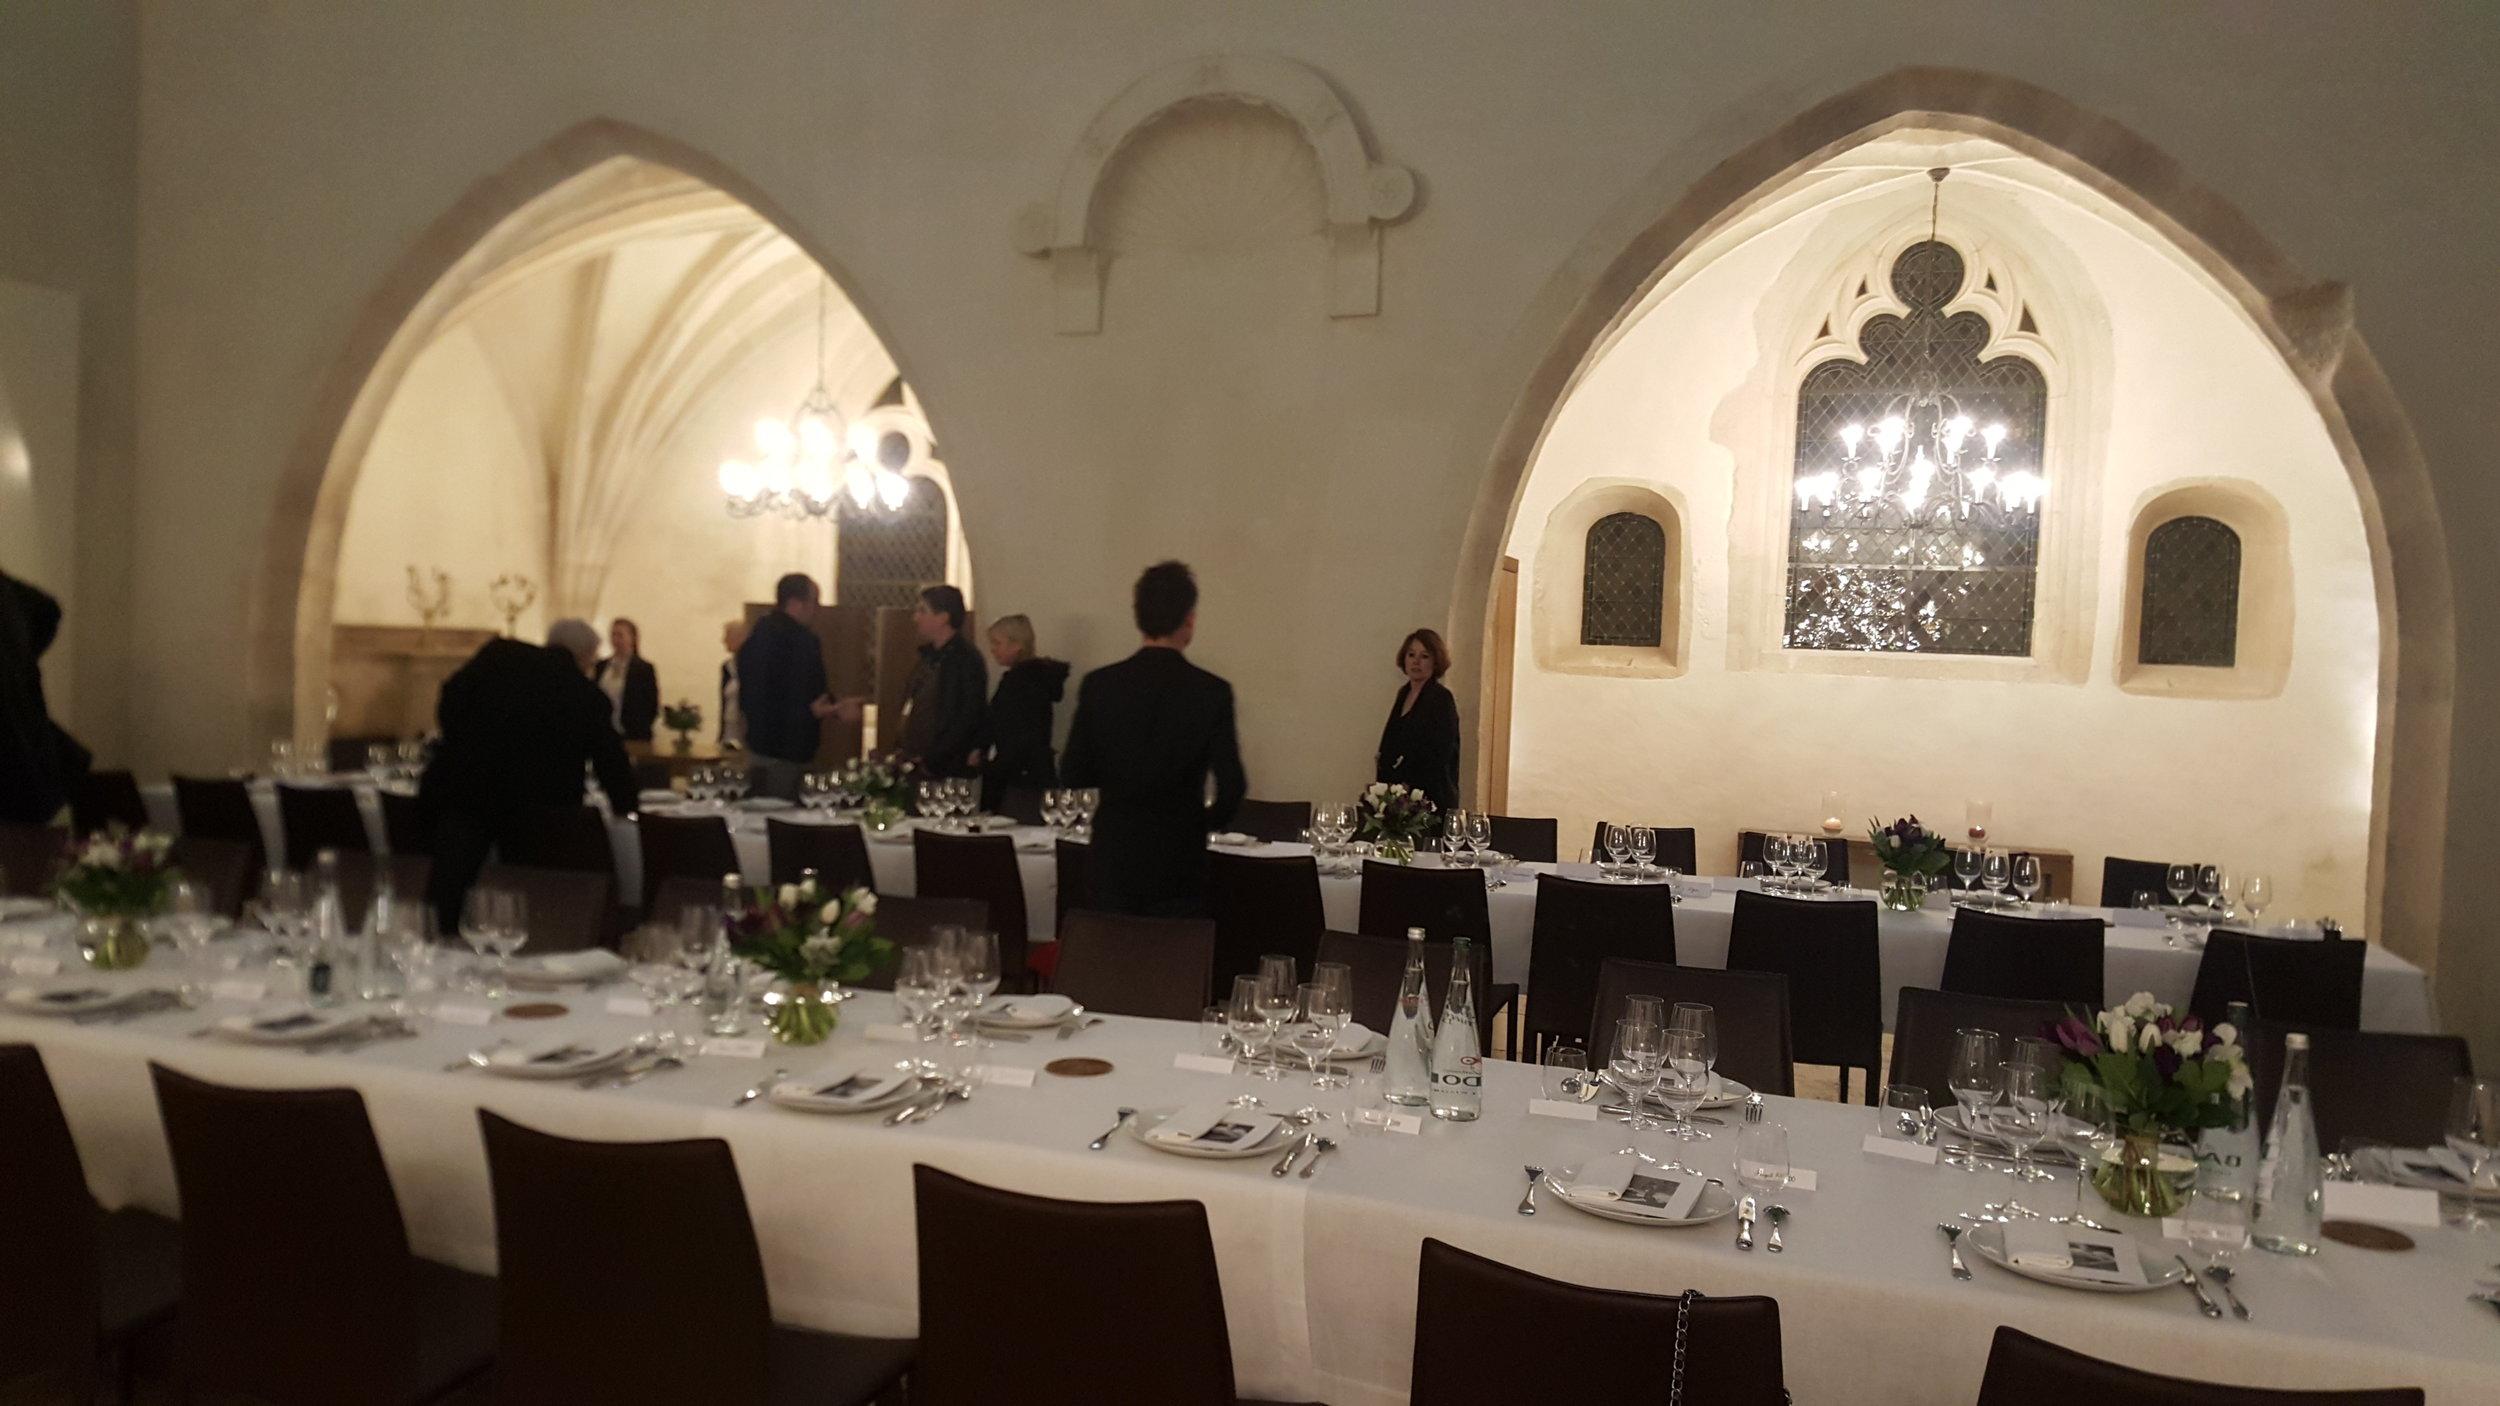 DINNER AT THE VINEYARD